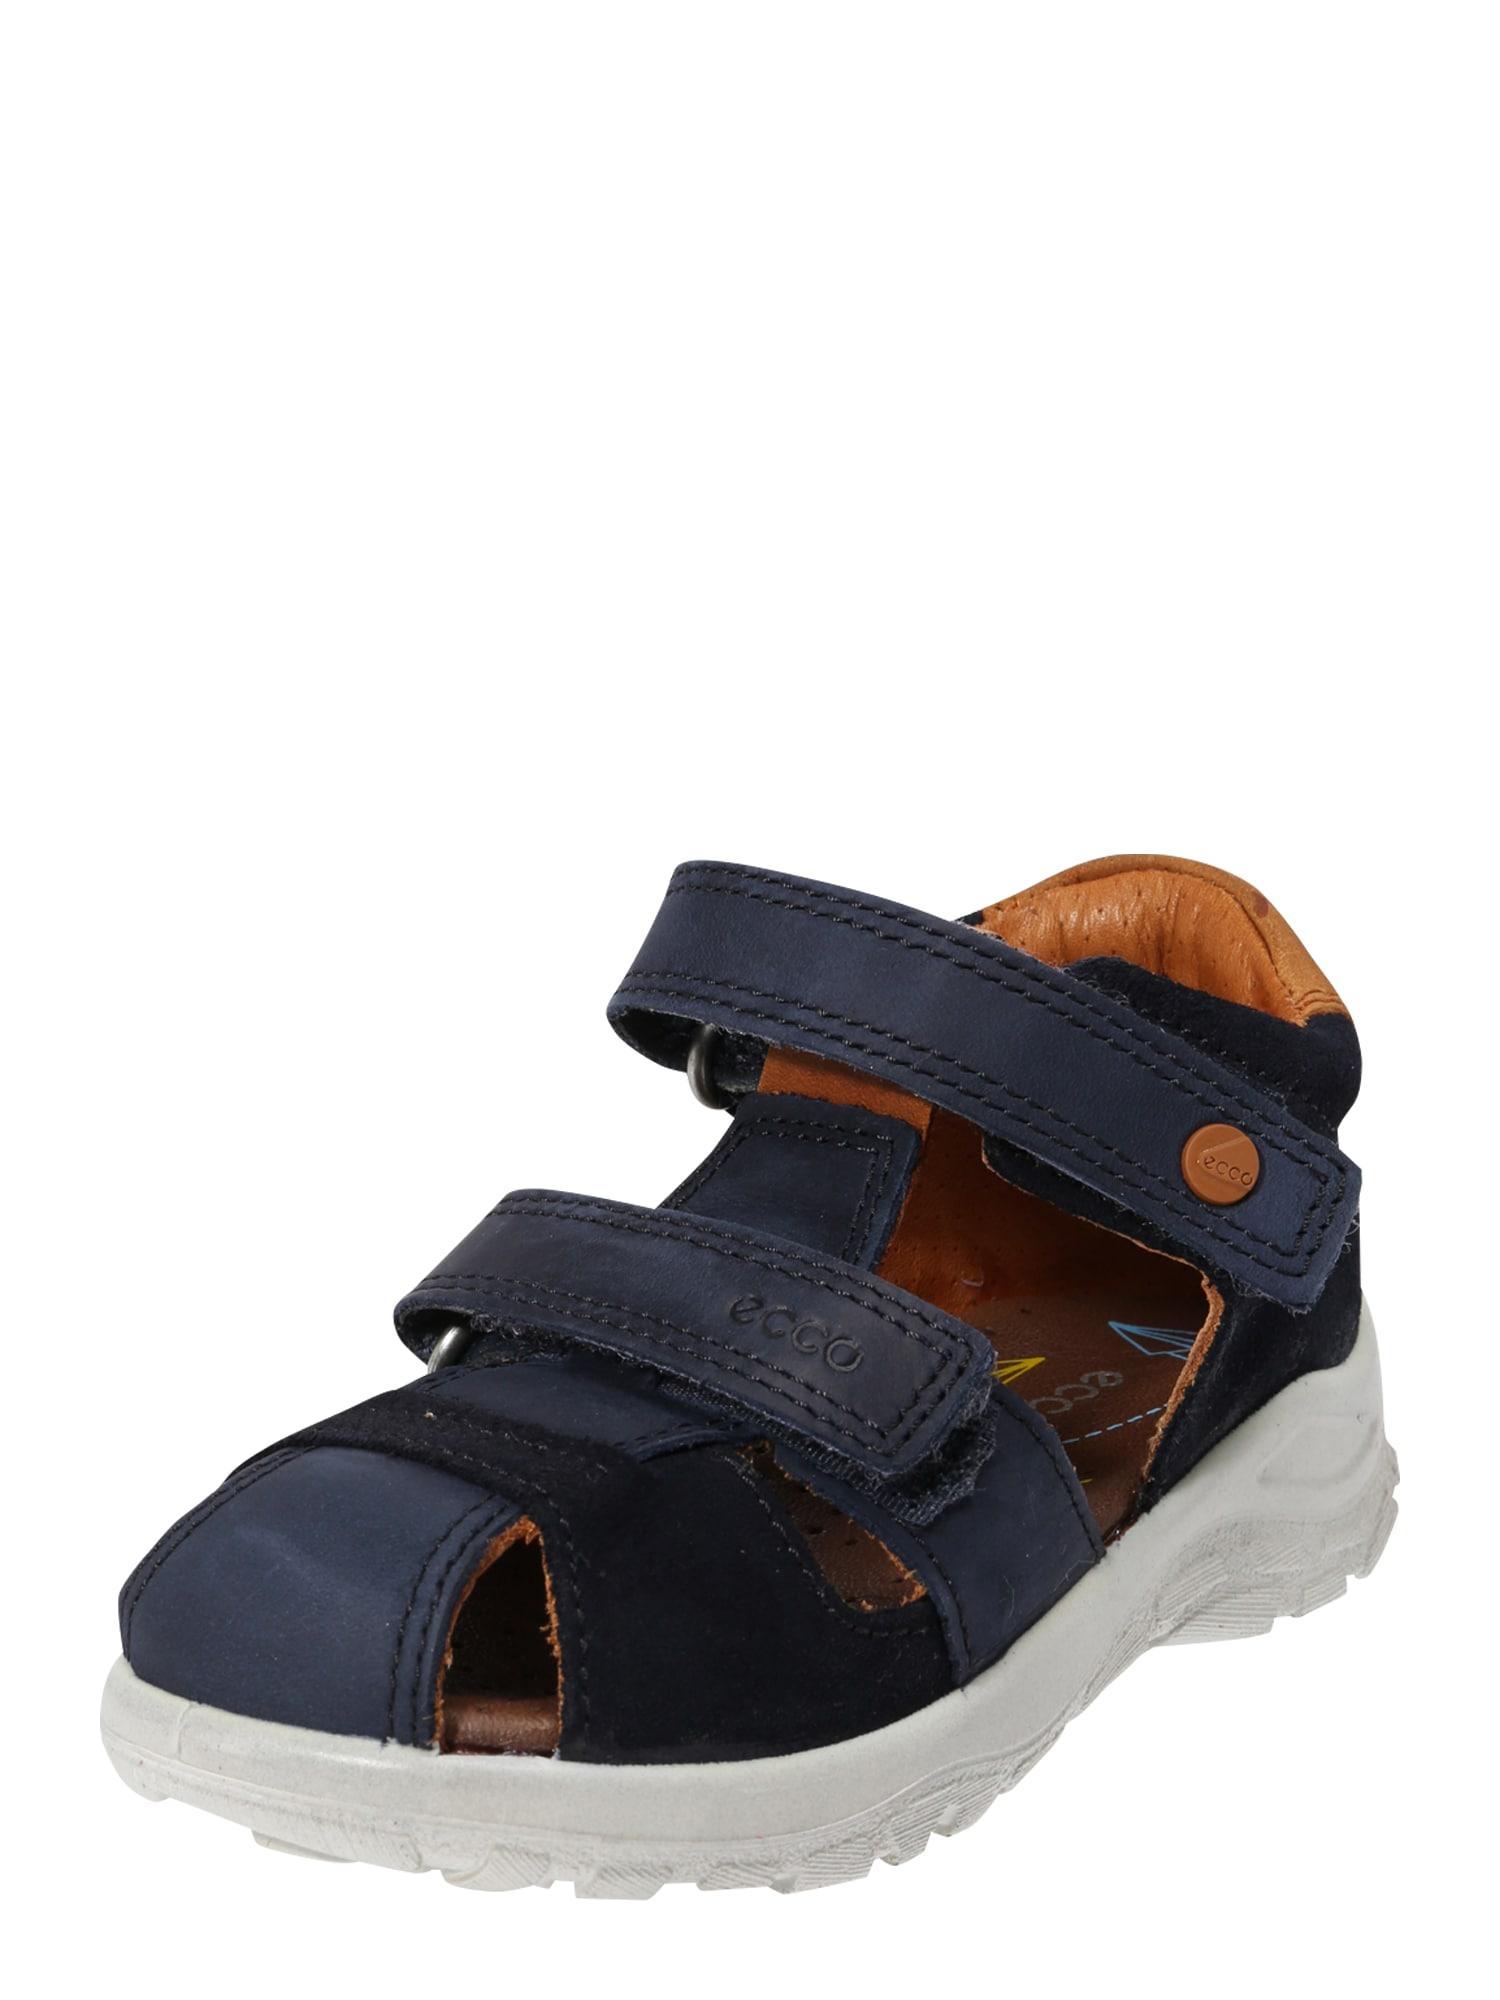 Otevřená obuv Peekaboo modrá ECCO